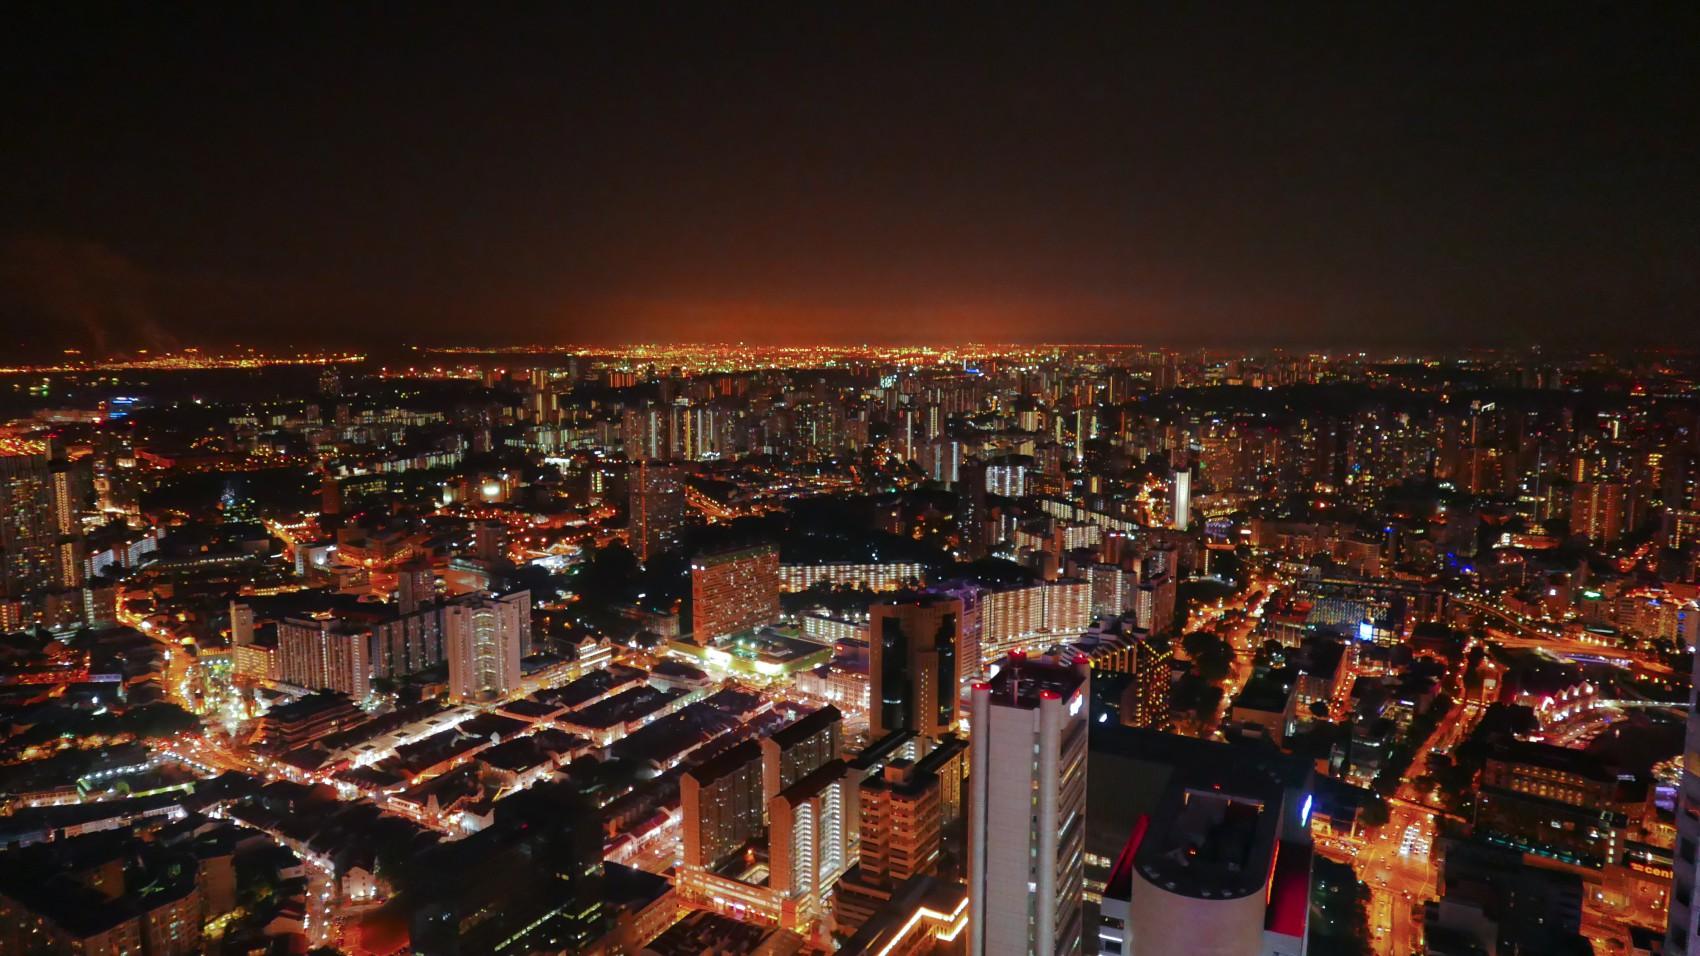 singap_robin-40-e1444985709244.jpg